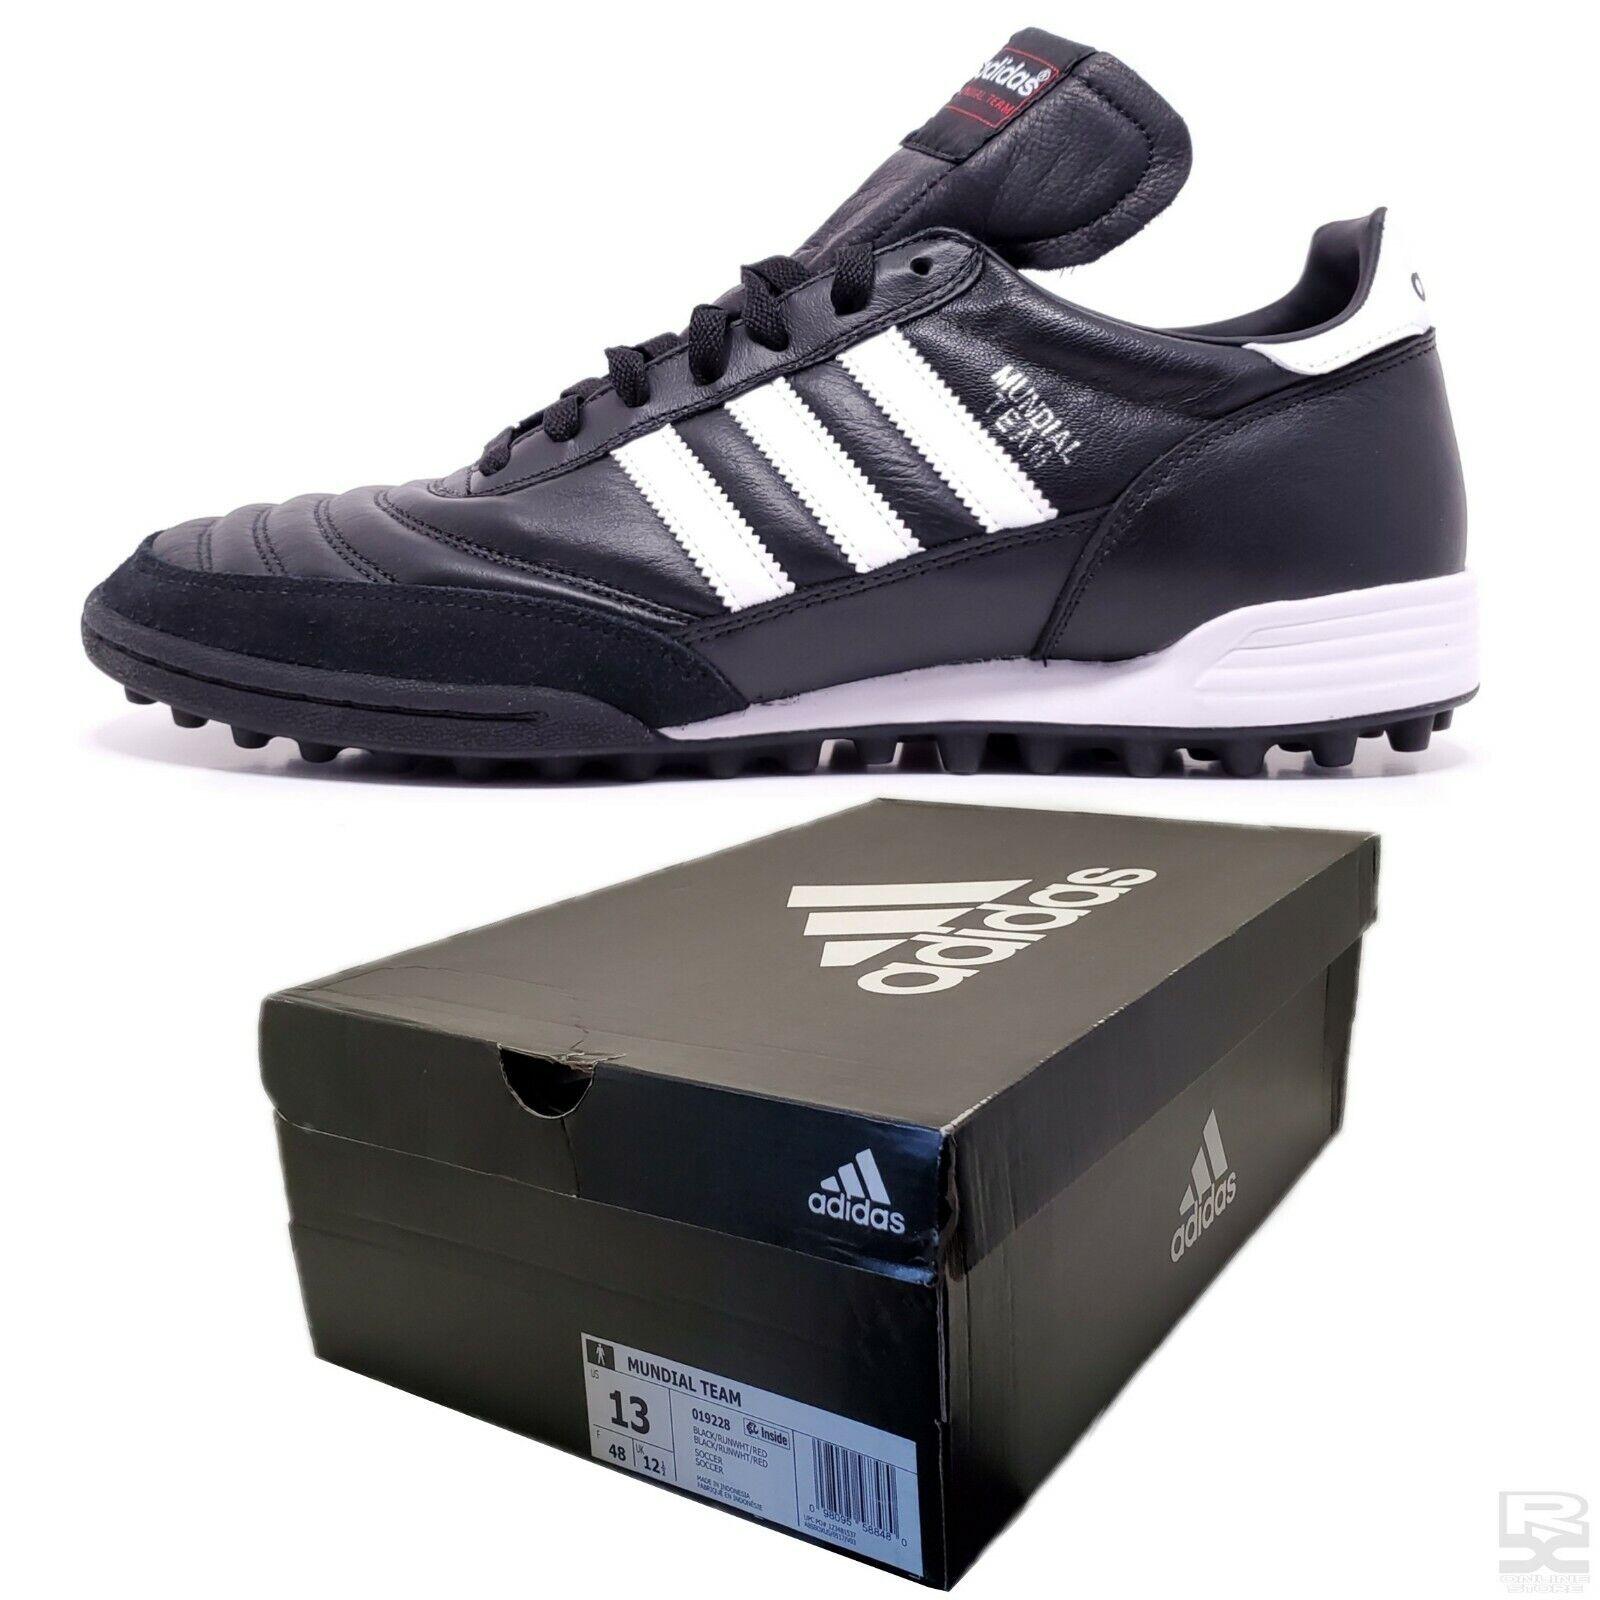 copa mundial turf soccer shoes cheap online